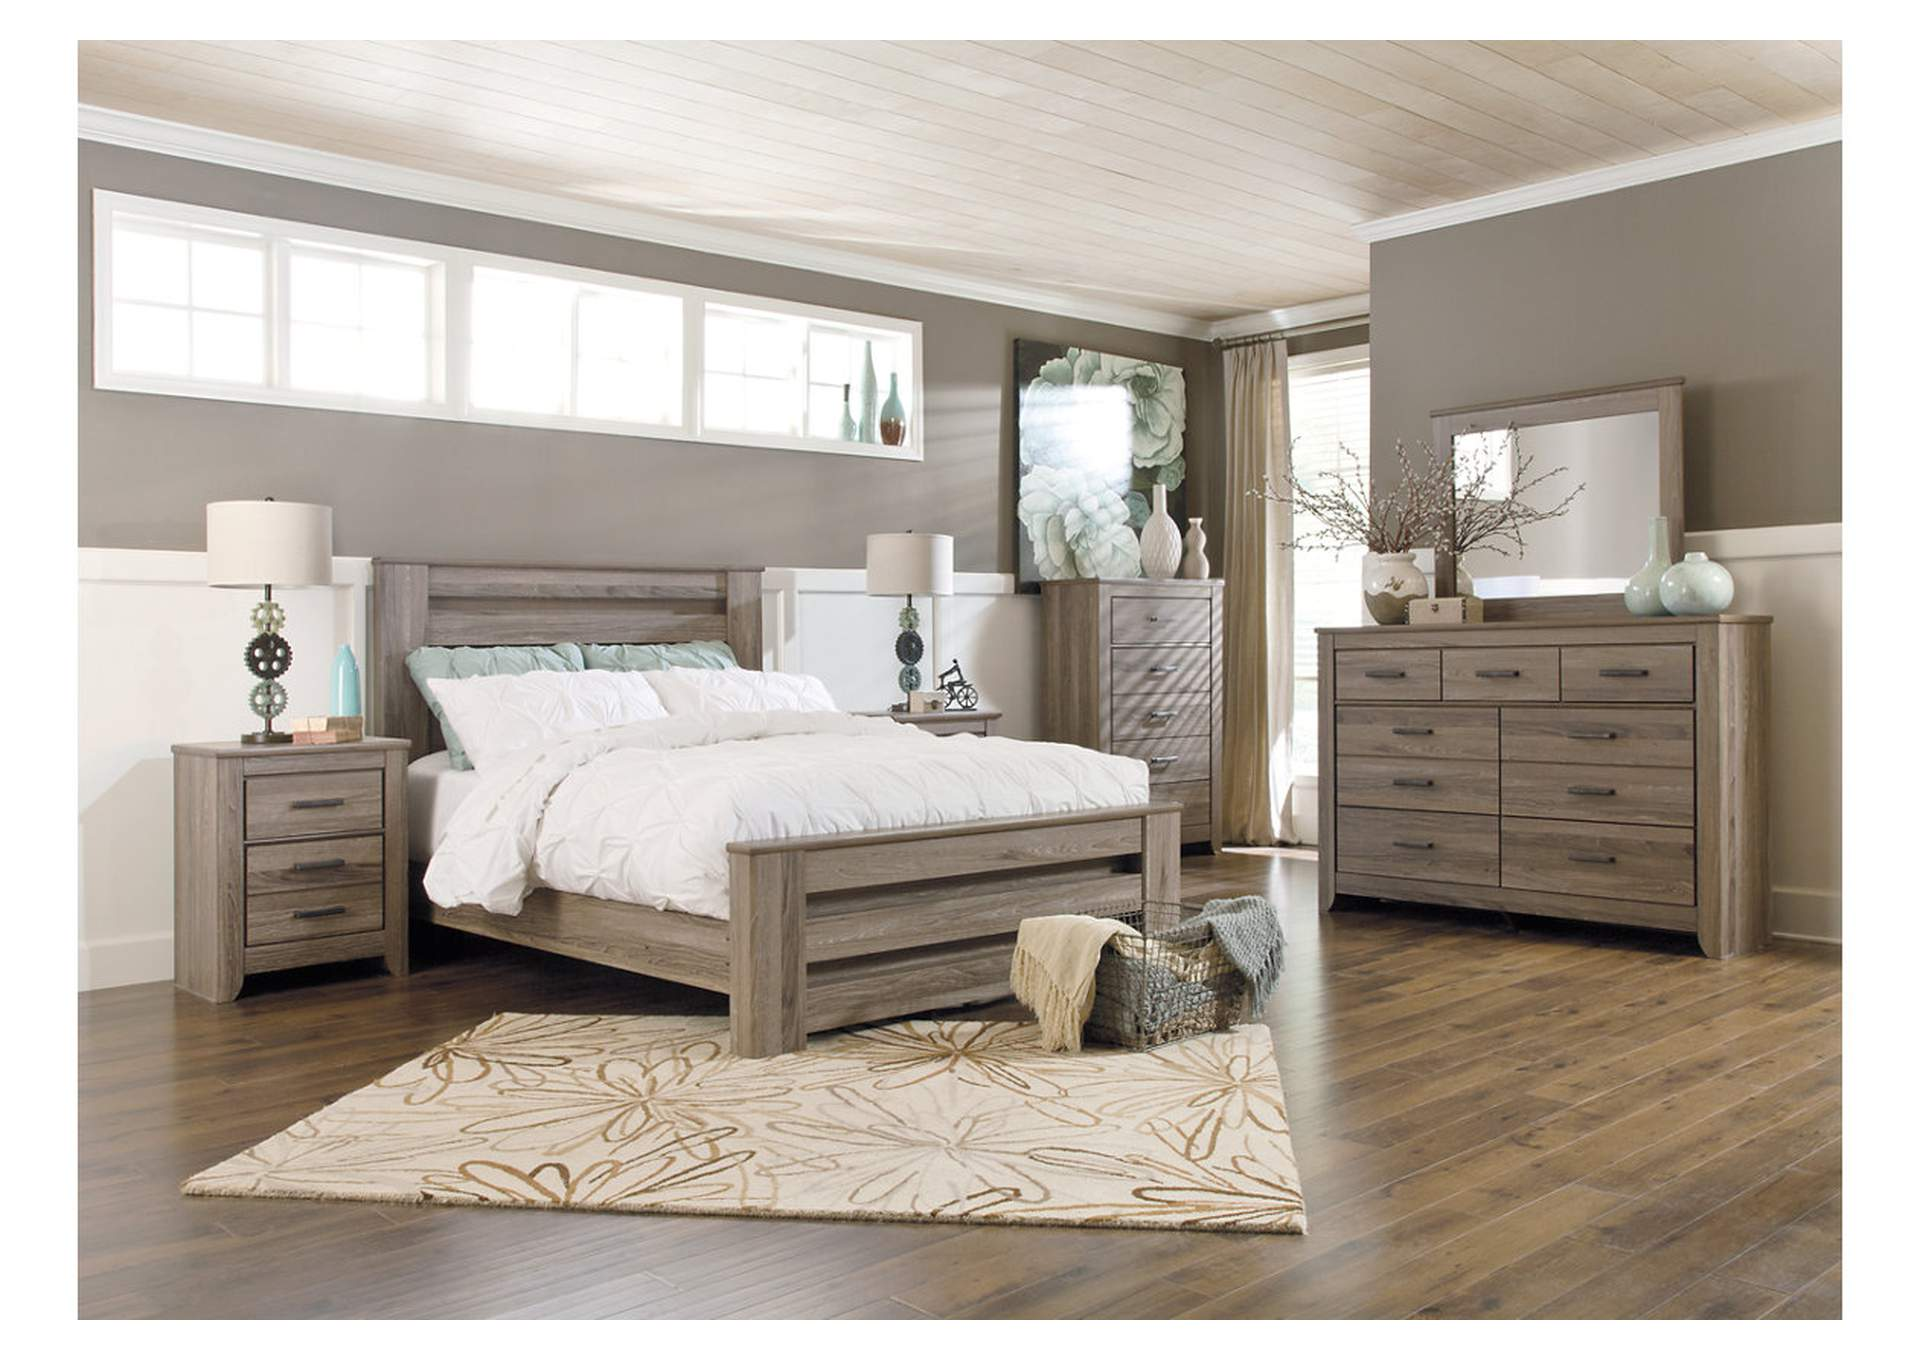 Best Buy Furniture And Mattress The Best For Less Zelen Queen Poster Bed Dresser Mirror